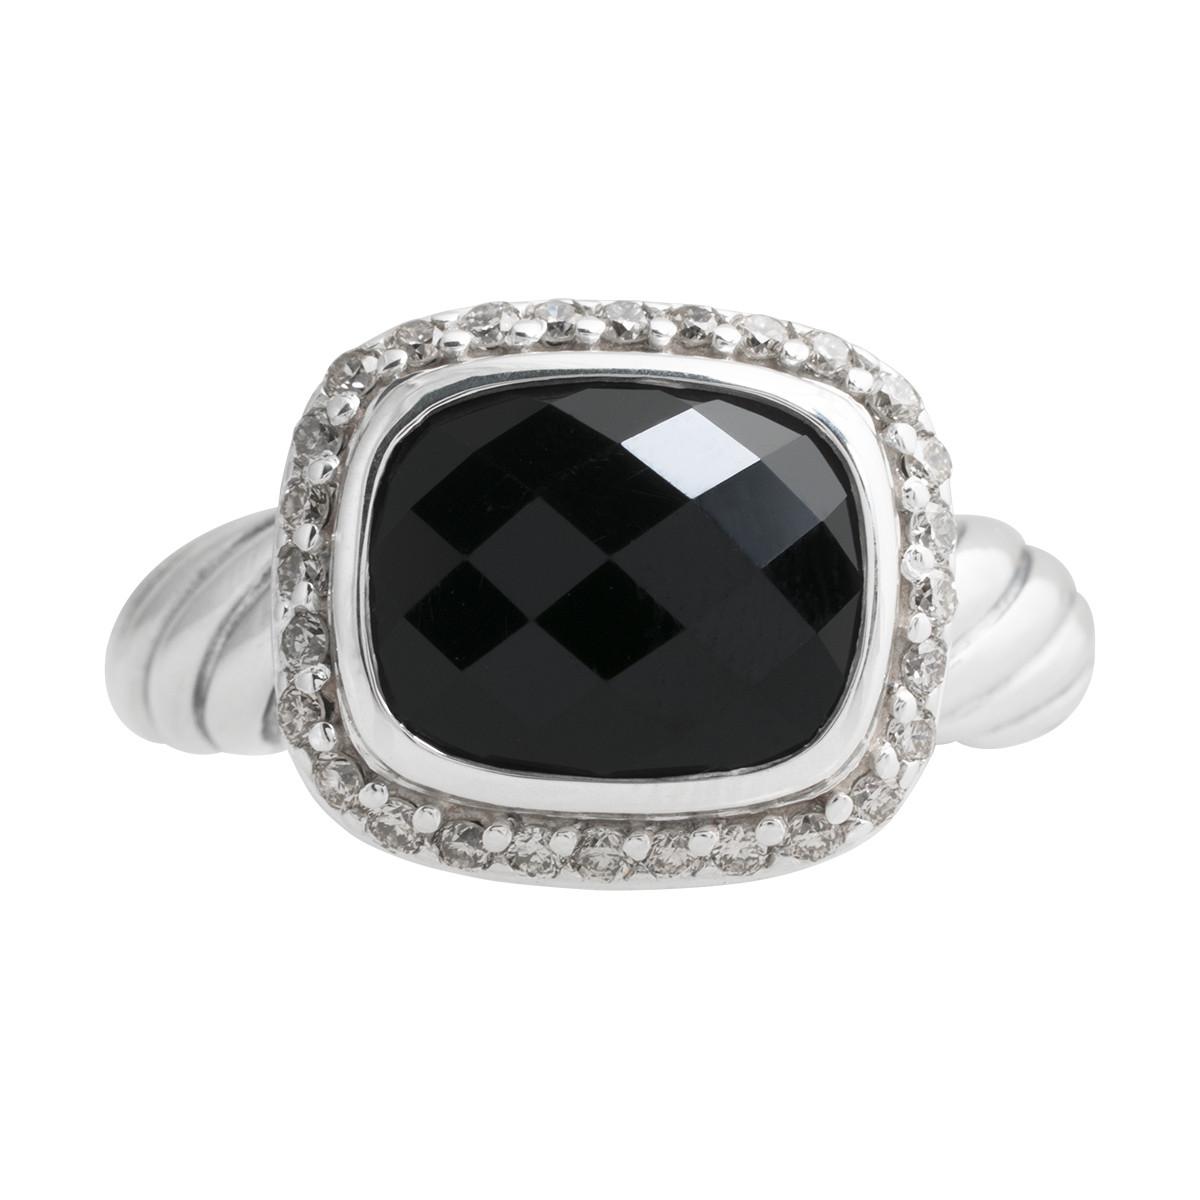 Vintage David Yurman 0.19 CTW Diamond & Onyx Halo Ring